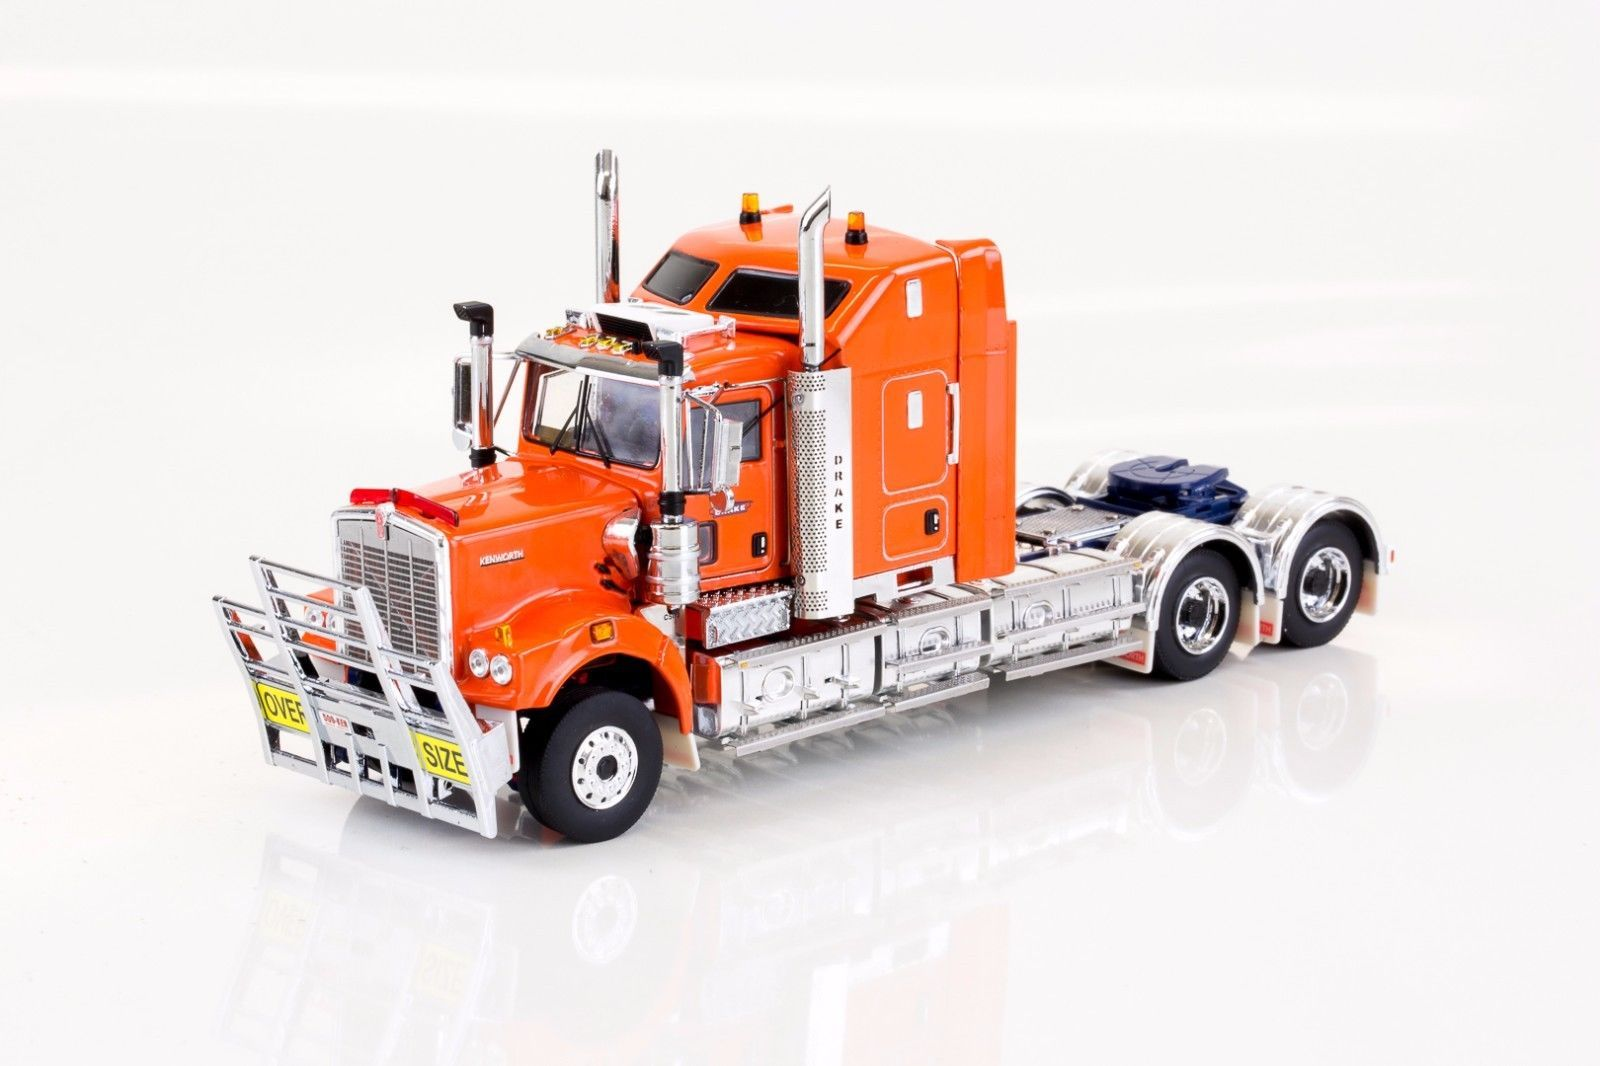 transformer kenworth c509 prime mover - drake orange - 1:50